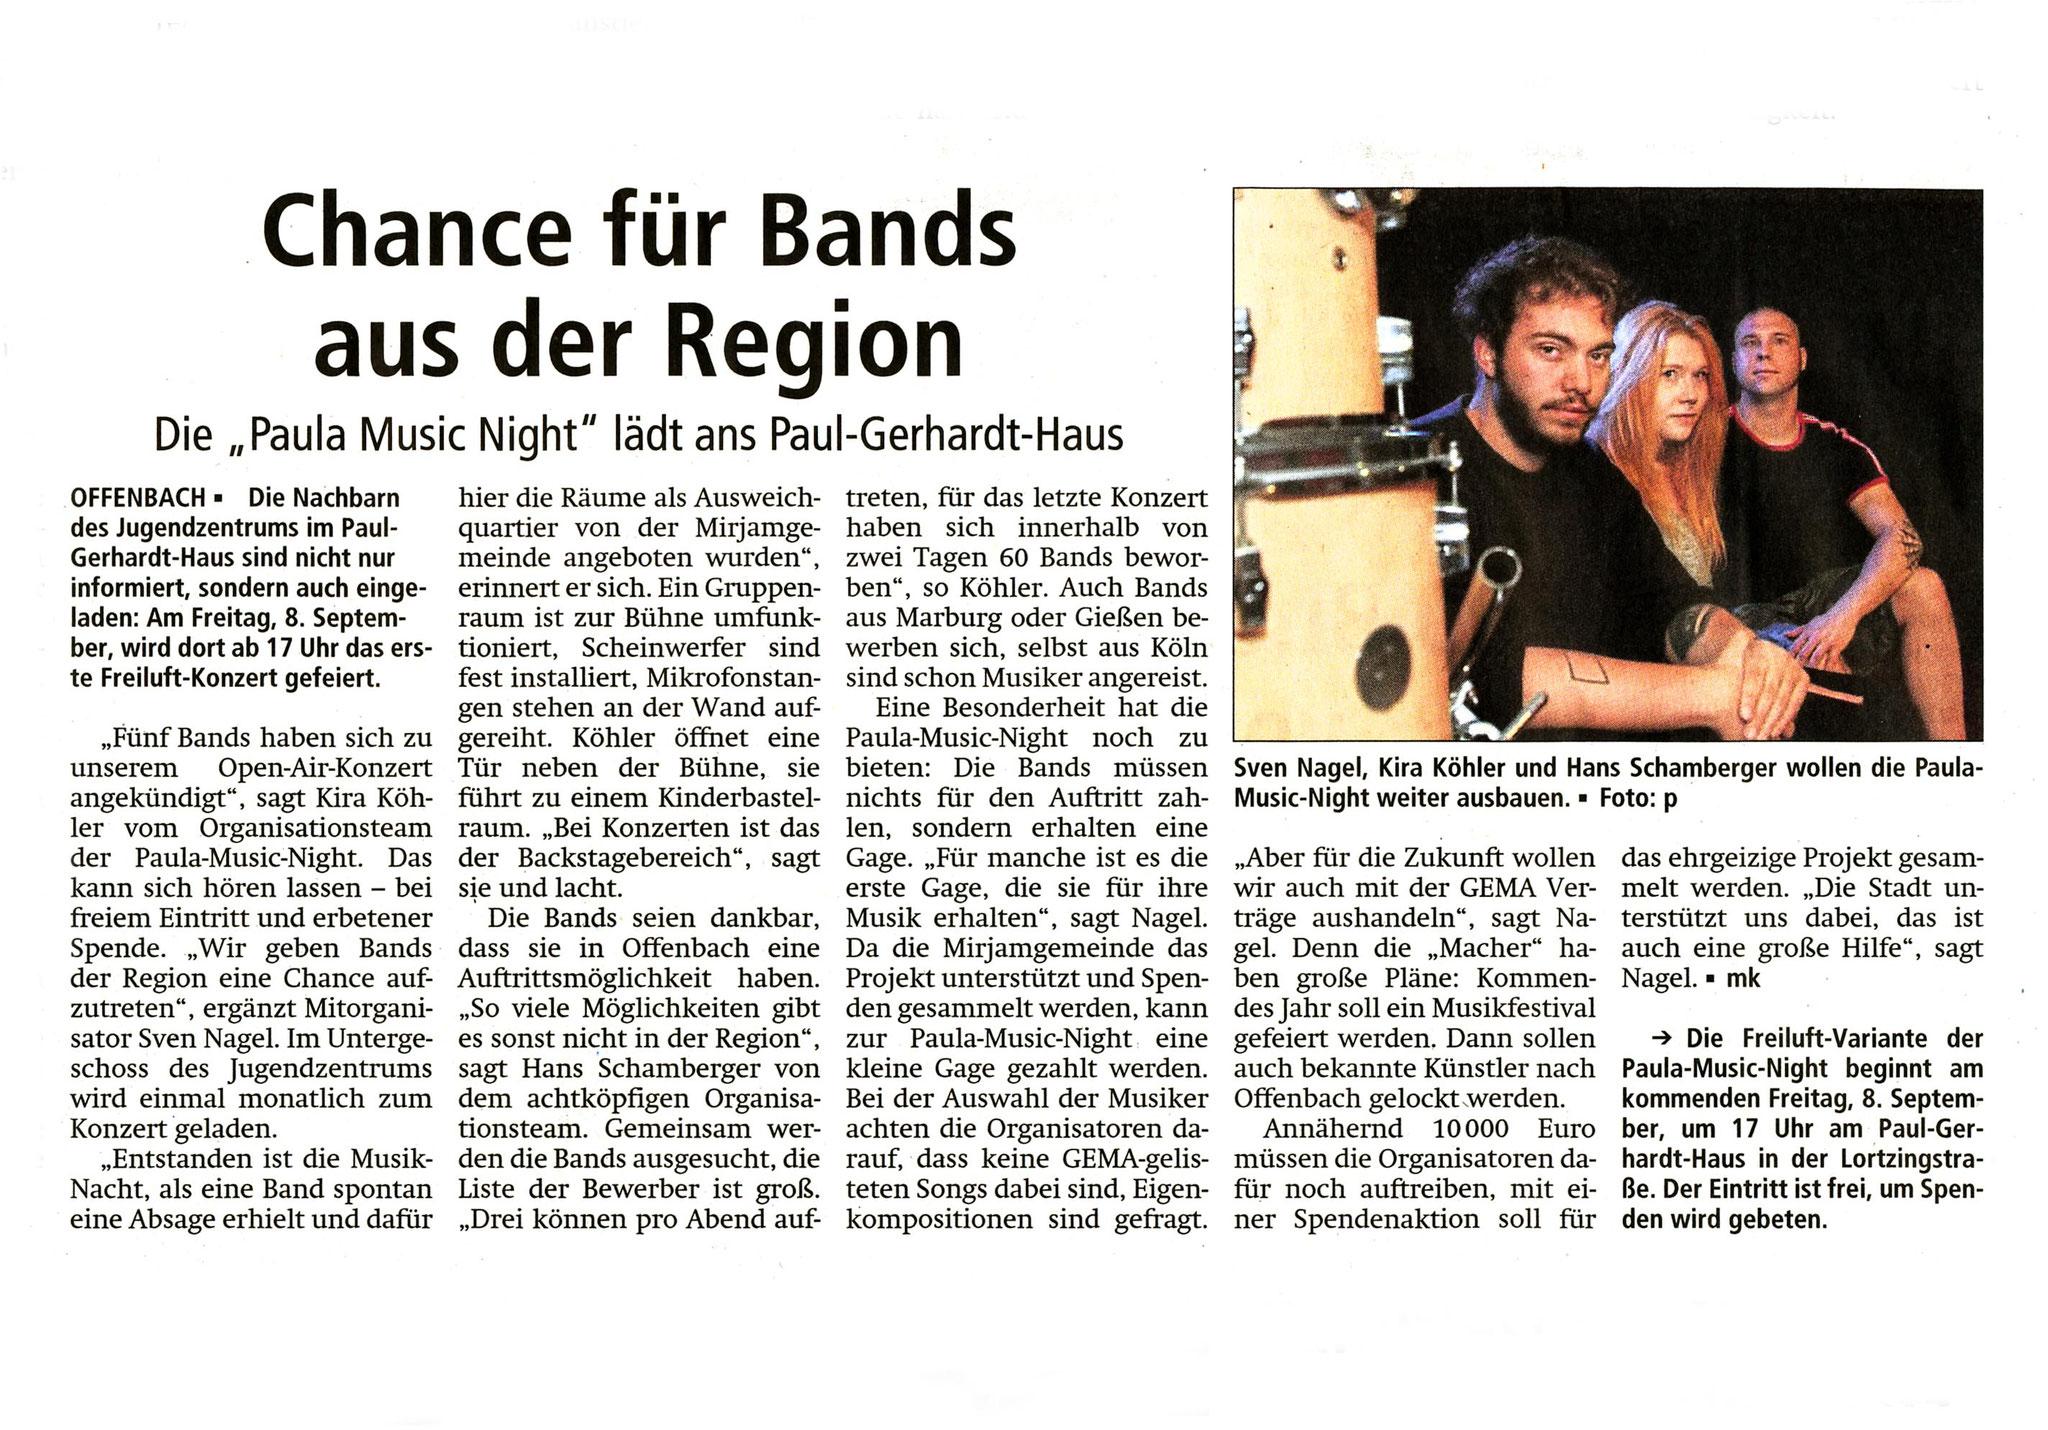 Offenbach Post, 4. September 2018